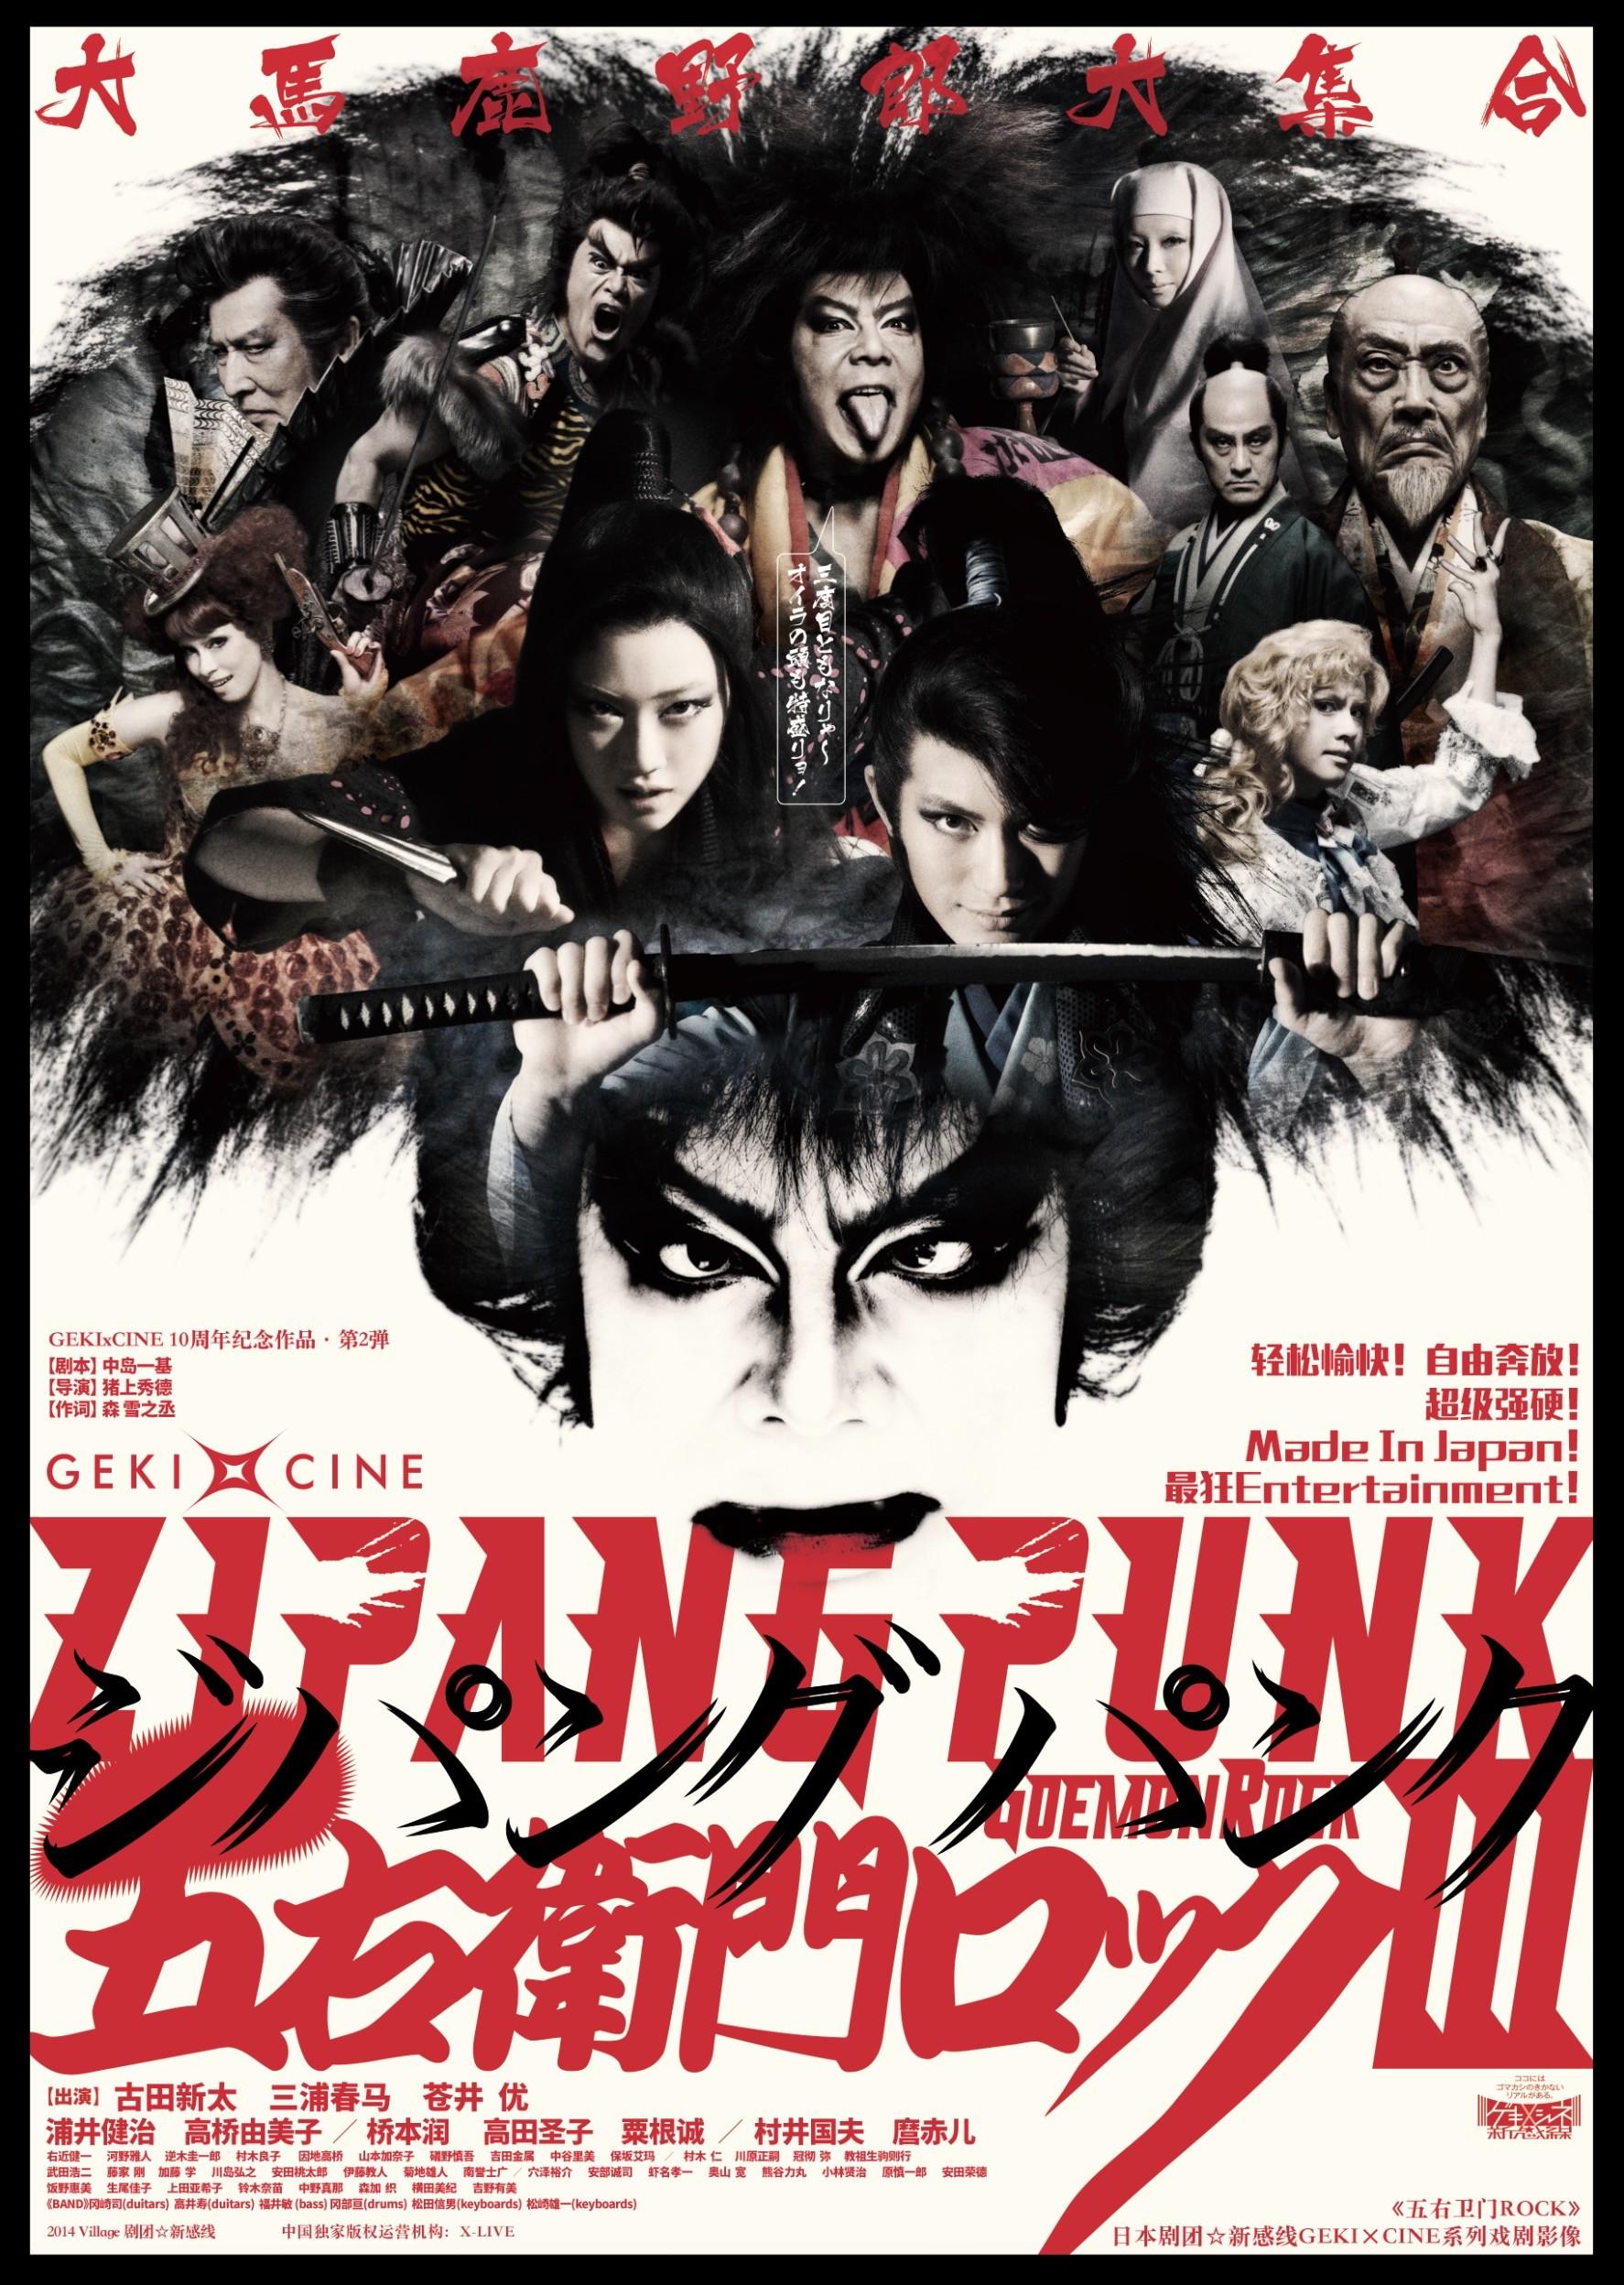 X-LIVE全力呈现:日本剧团☆新感线GEKI×CINE系列戏剧影像《日本朋克五右卫门摇滚3》-宁波